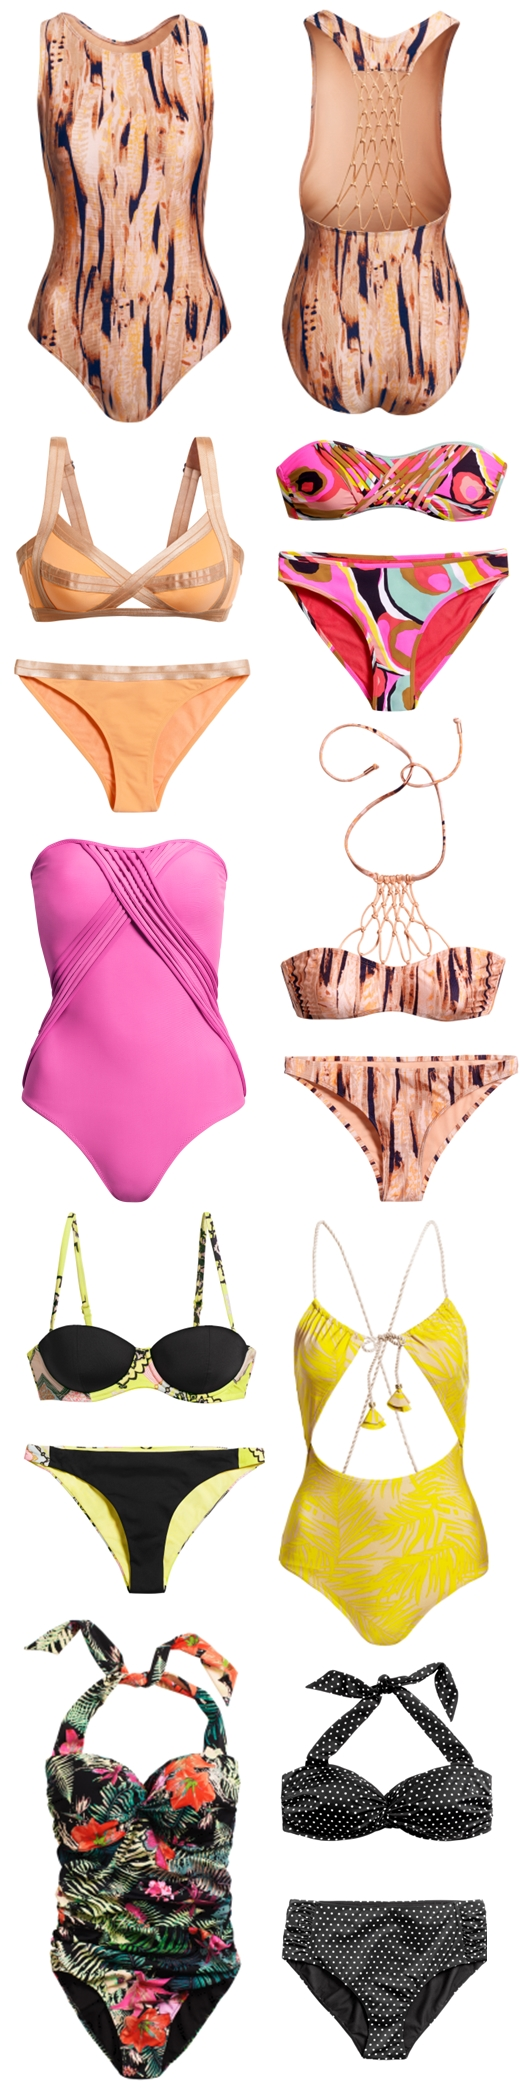 hm swimwear 2012, H&M badetøj 2012, H&M bikini sommer 2012, H&M bikini 2012, H&M badedragt sommer, H&M summer swimsuit